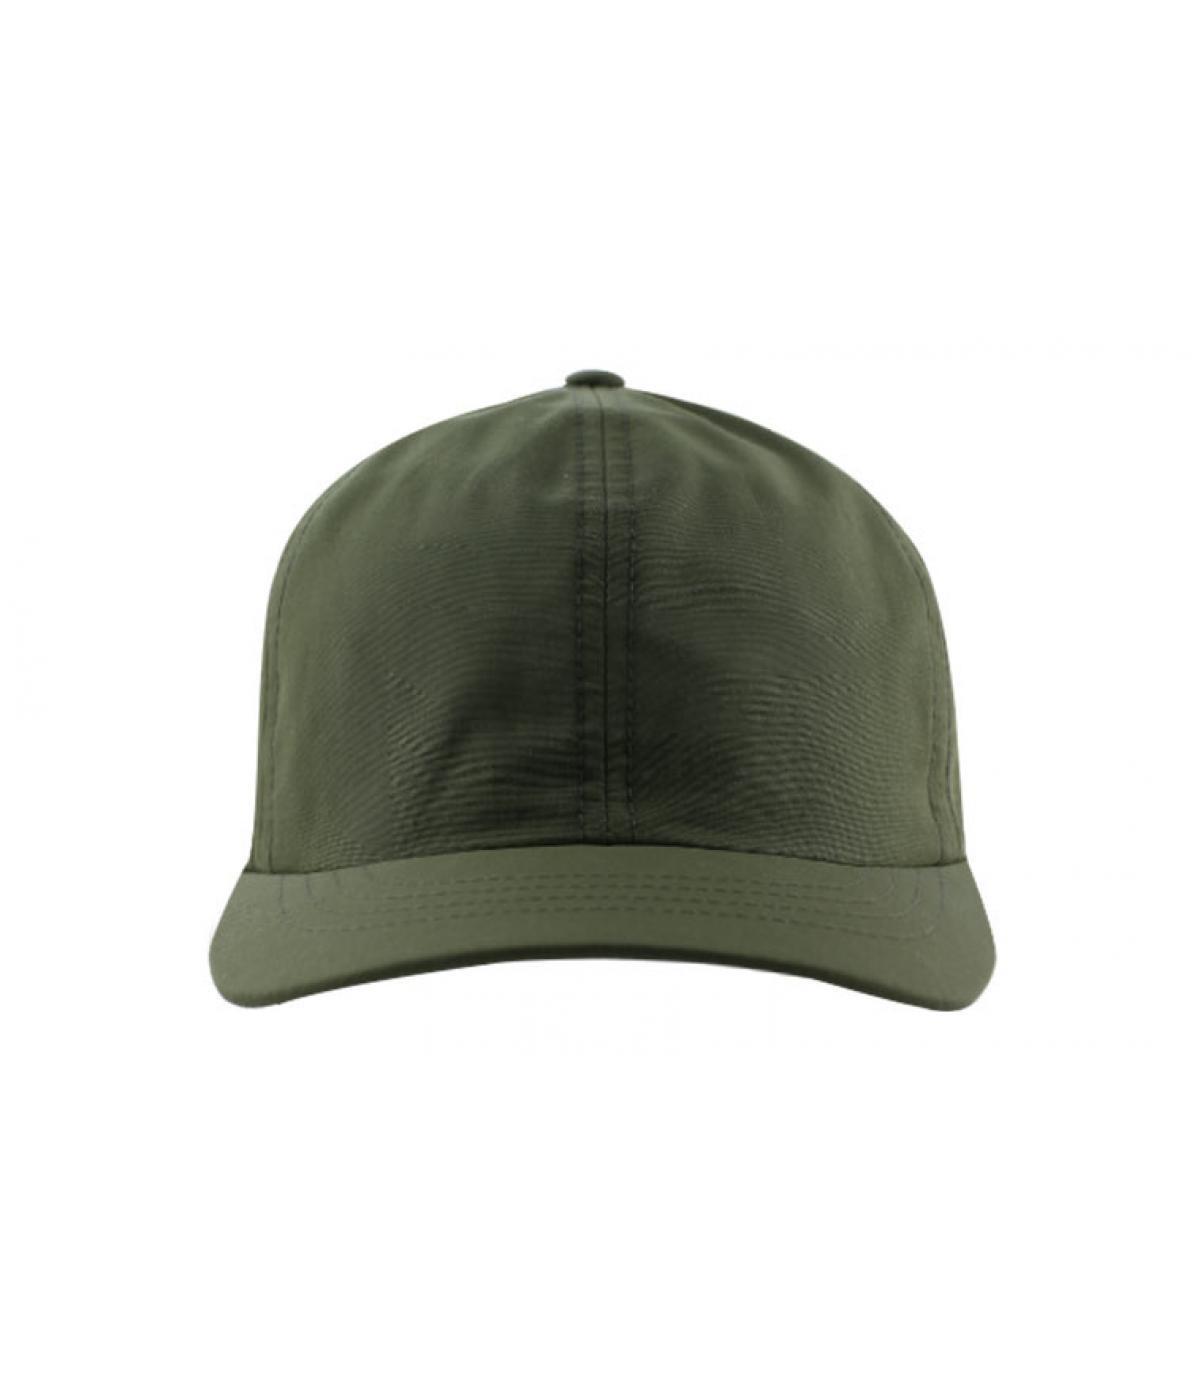 Personalisierung Curved Cap olivgrün